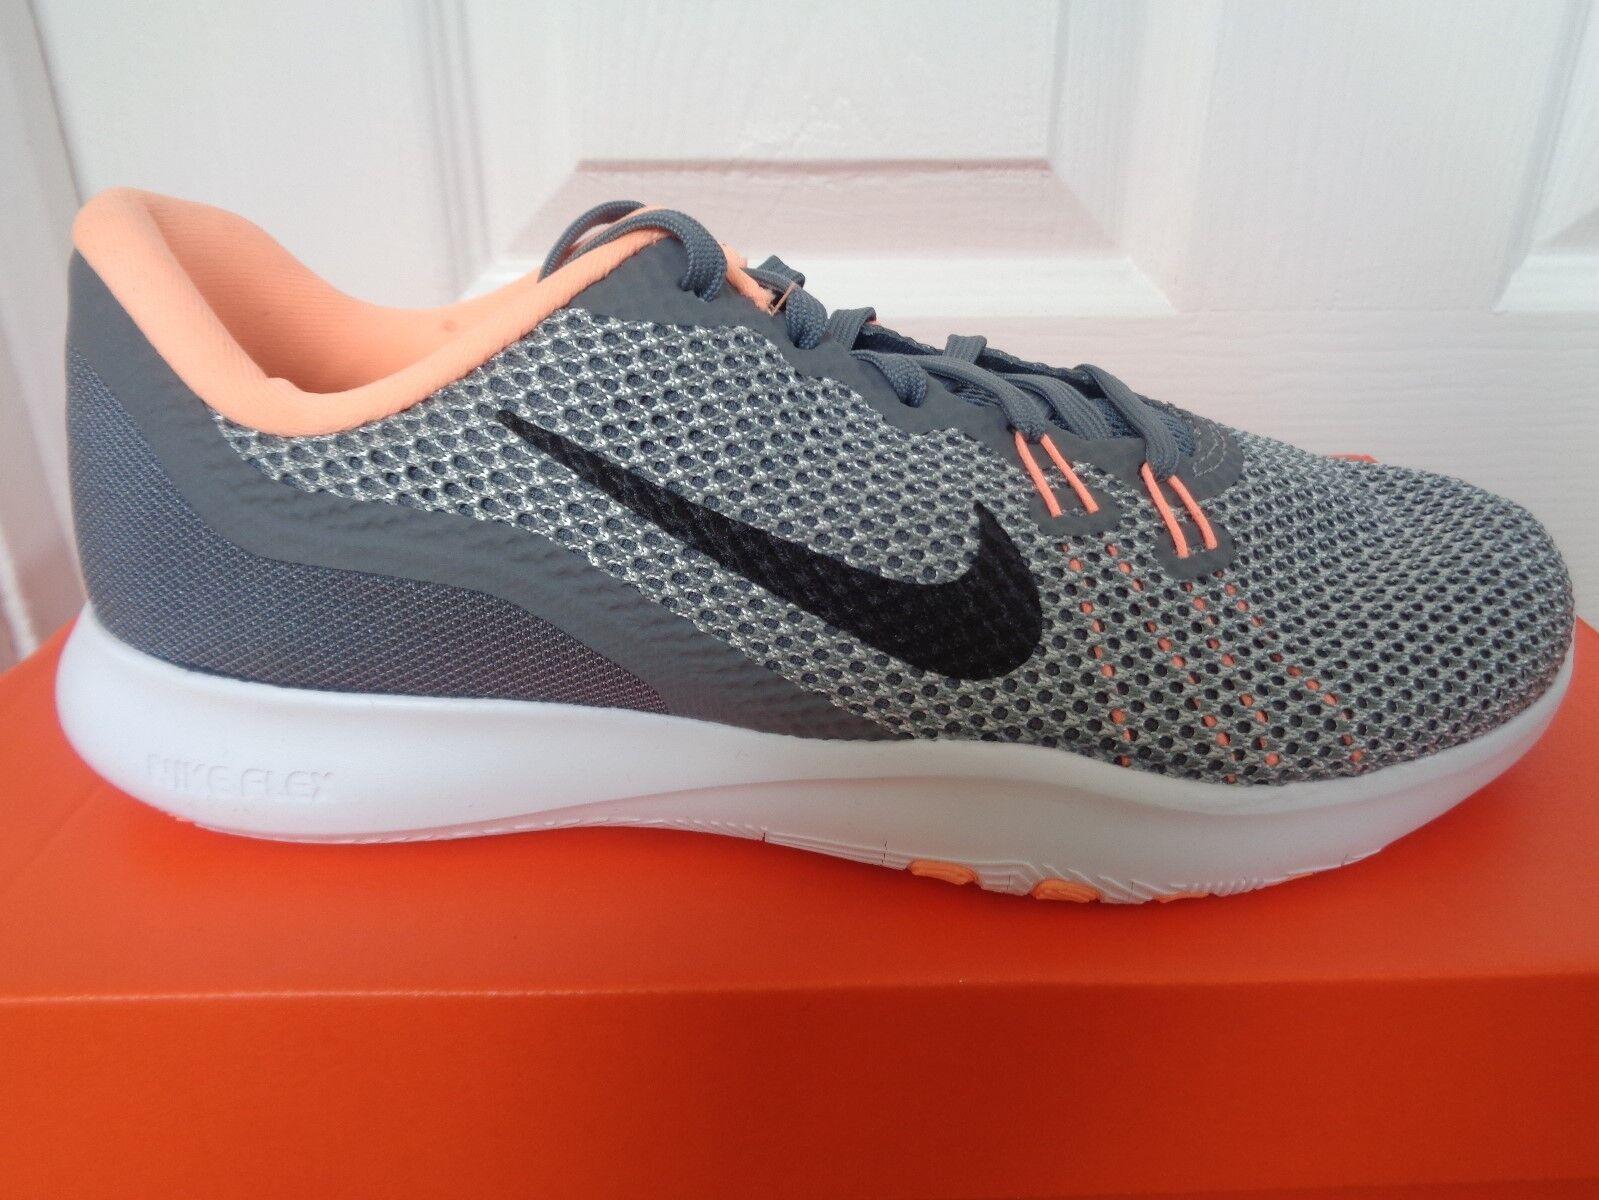 Nike Flex Trainer 7 wmns trainers  chaussures  89849 002 uk 5 eu 38.5 us 7.5 NEW+BOX